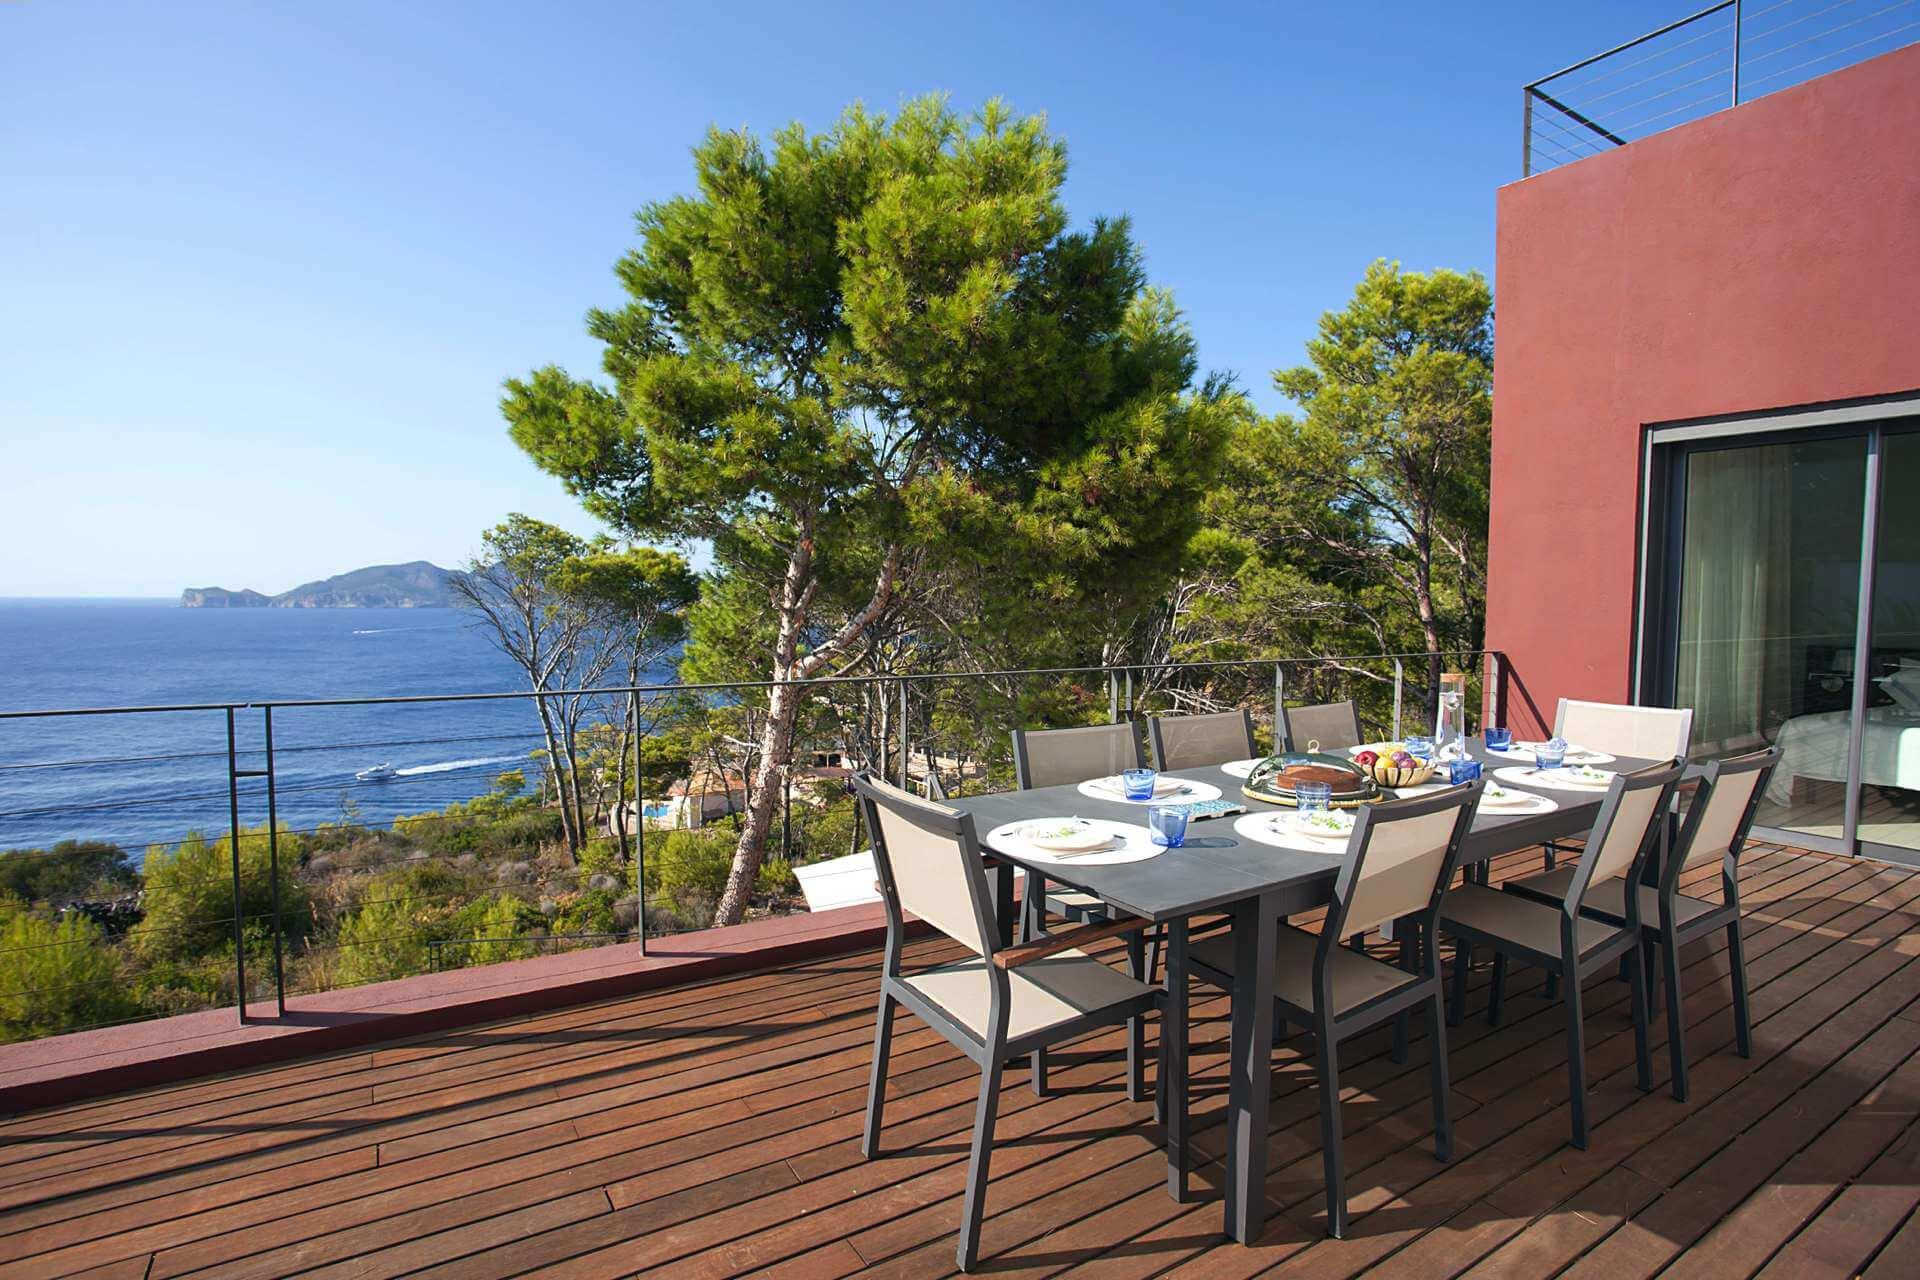 01-332 Meerblick Villa Mallorca Südwesten Bild 13